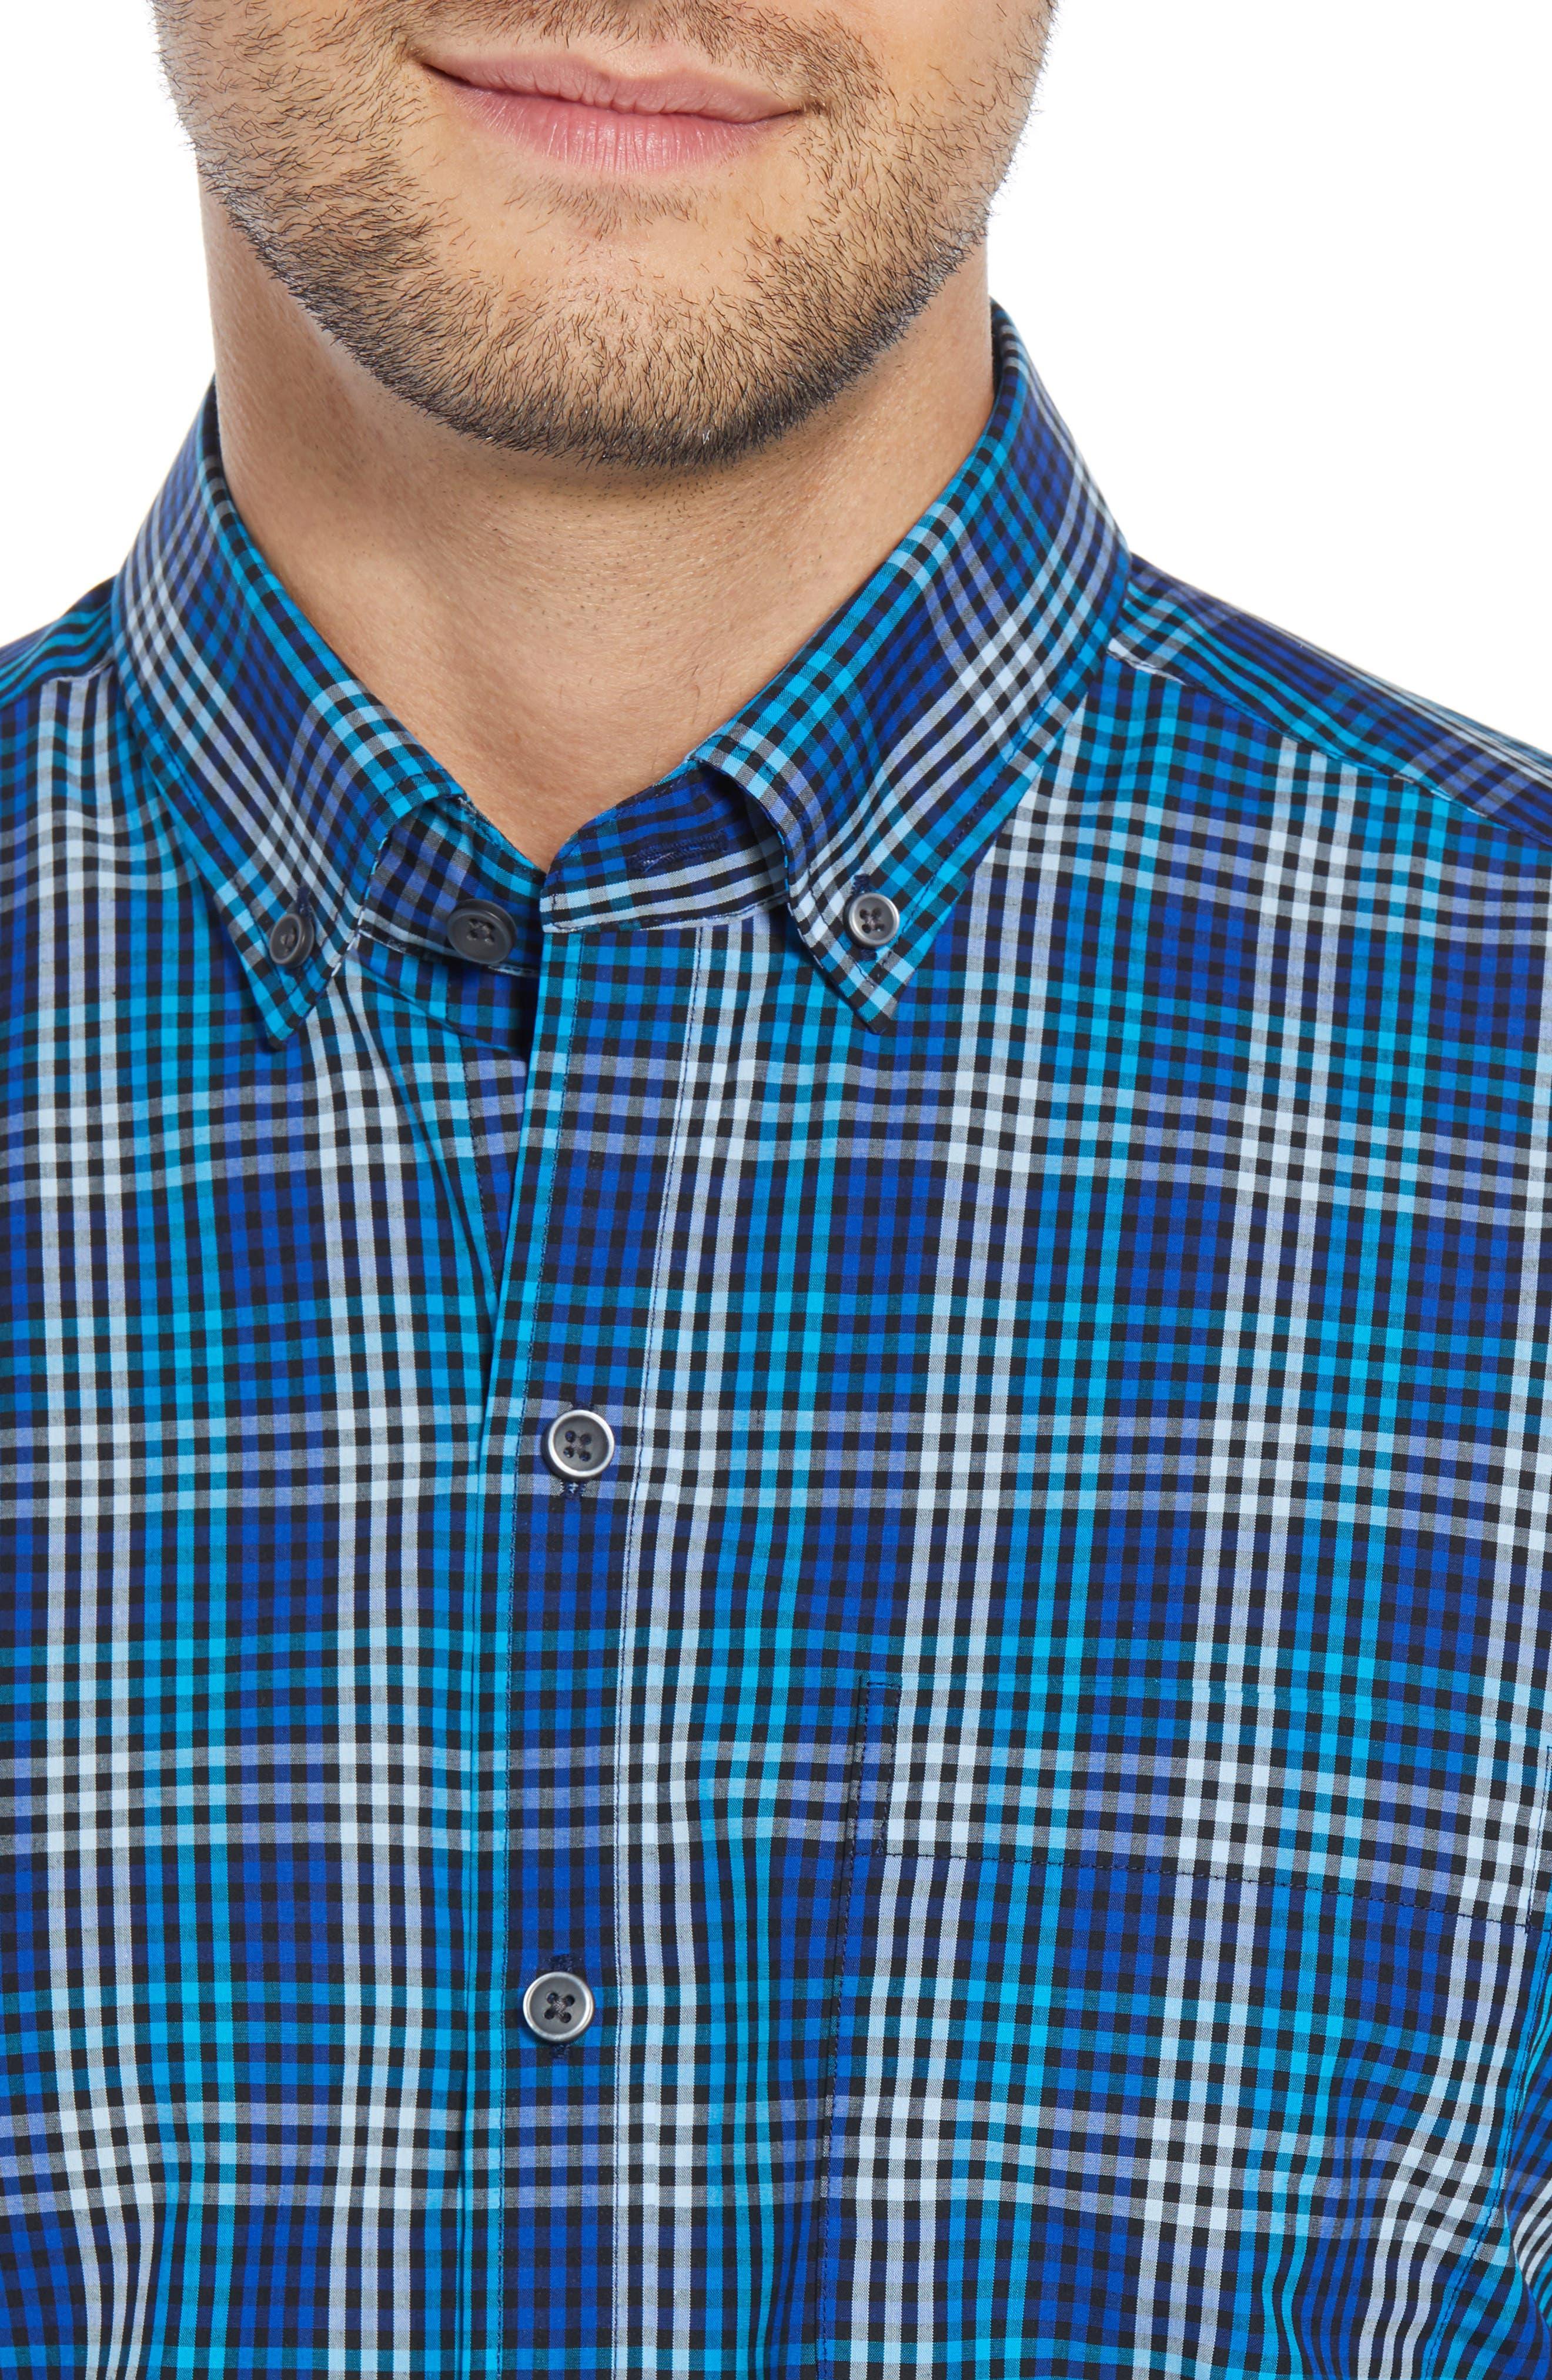 Regular Fit Non-Iron Sport Shirt,                             Alternate thumbnail 2, color,                             ORBIT